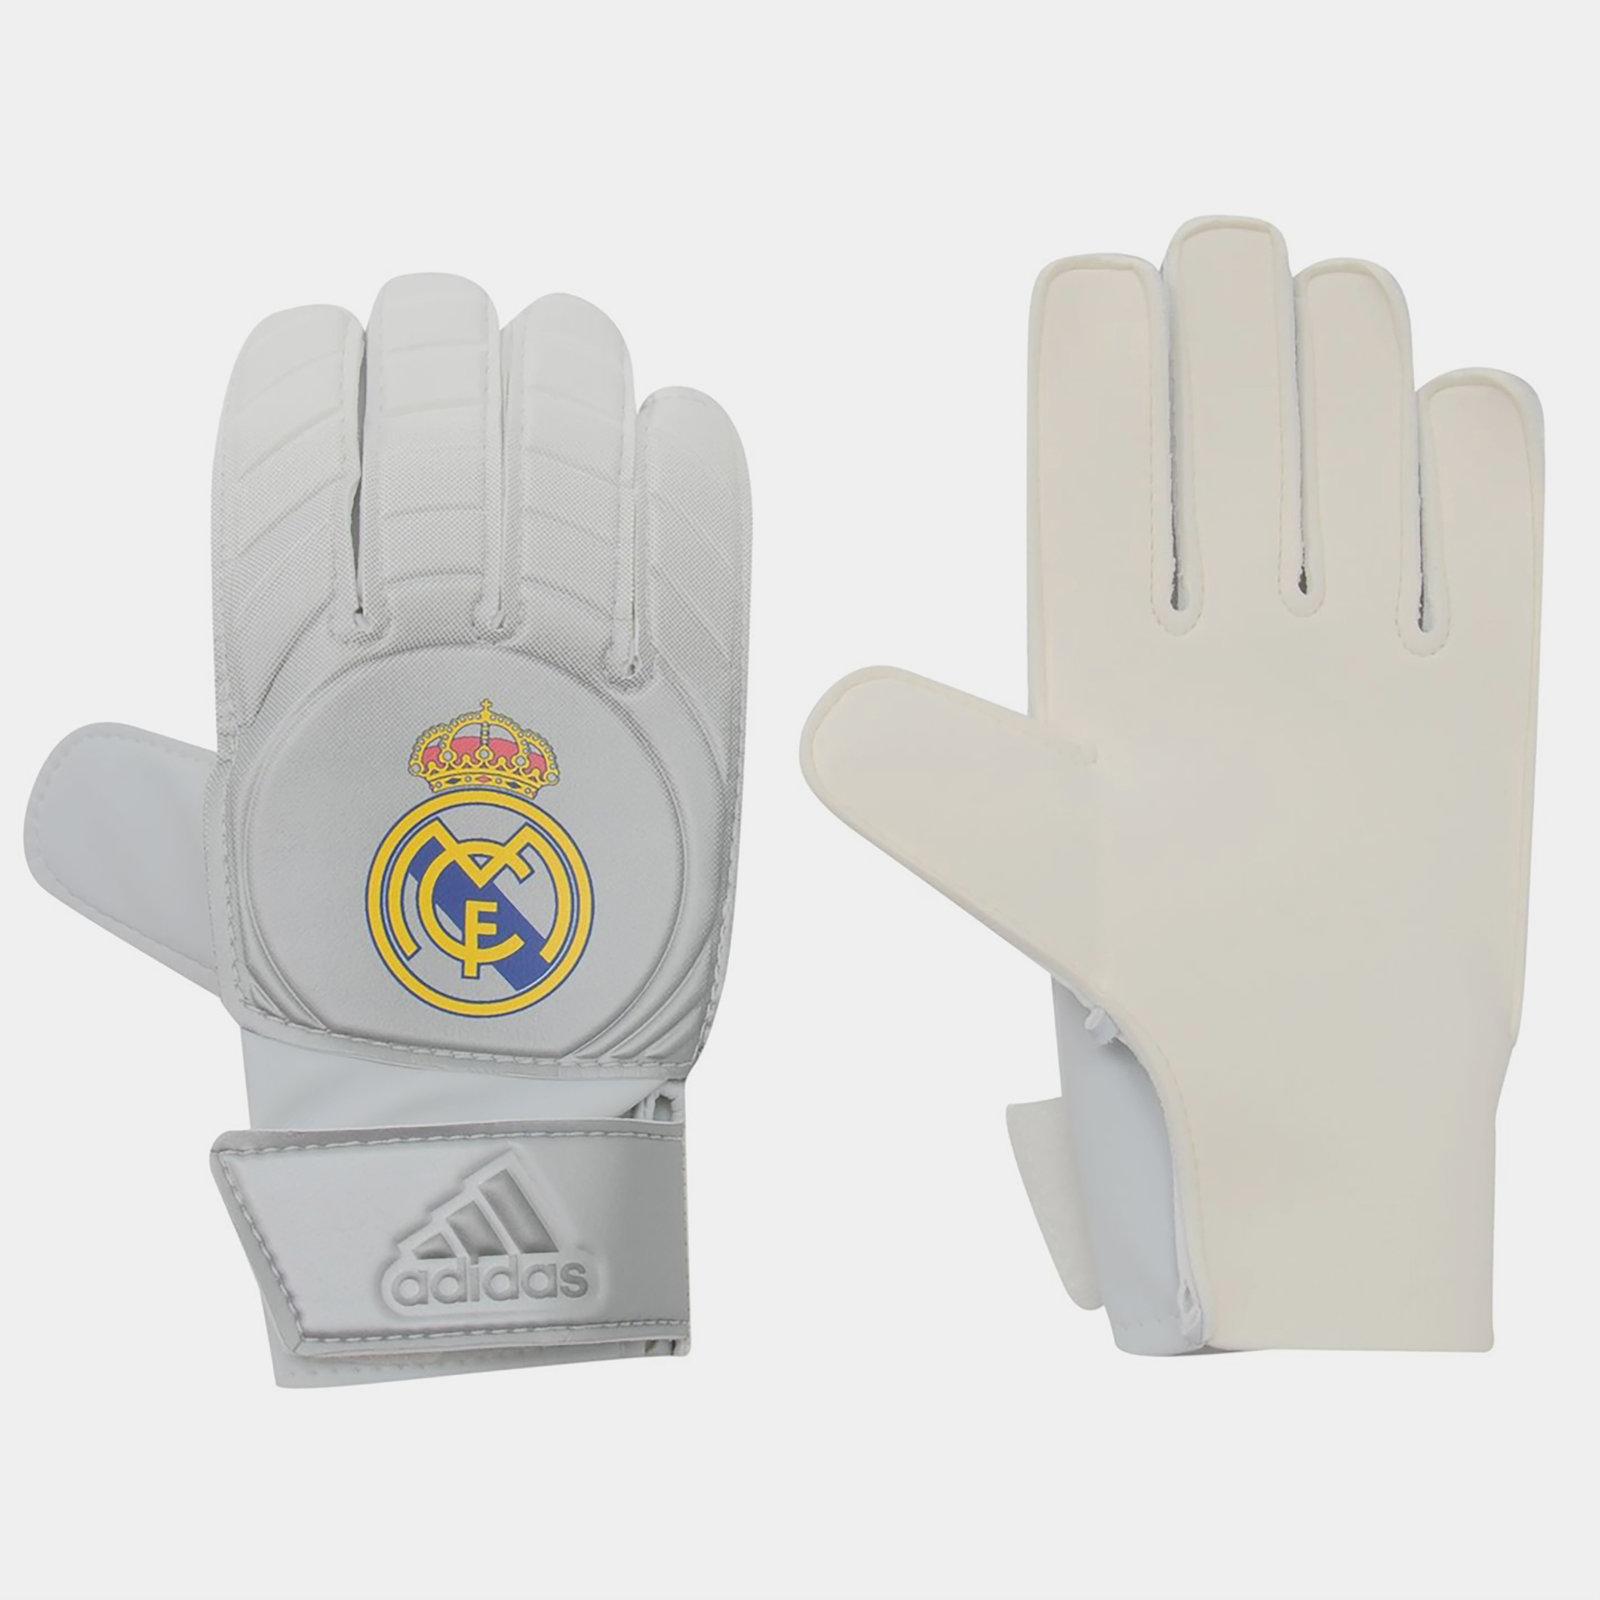 Predator 20 Match Goalkeeper Gloves